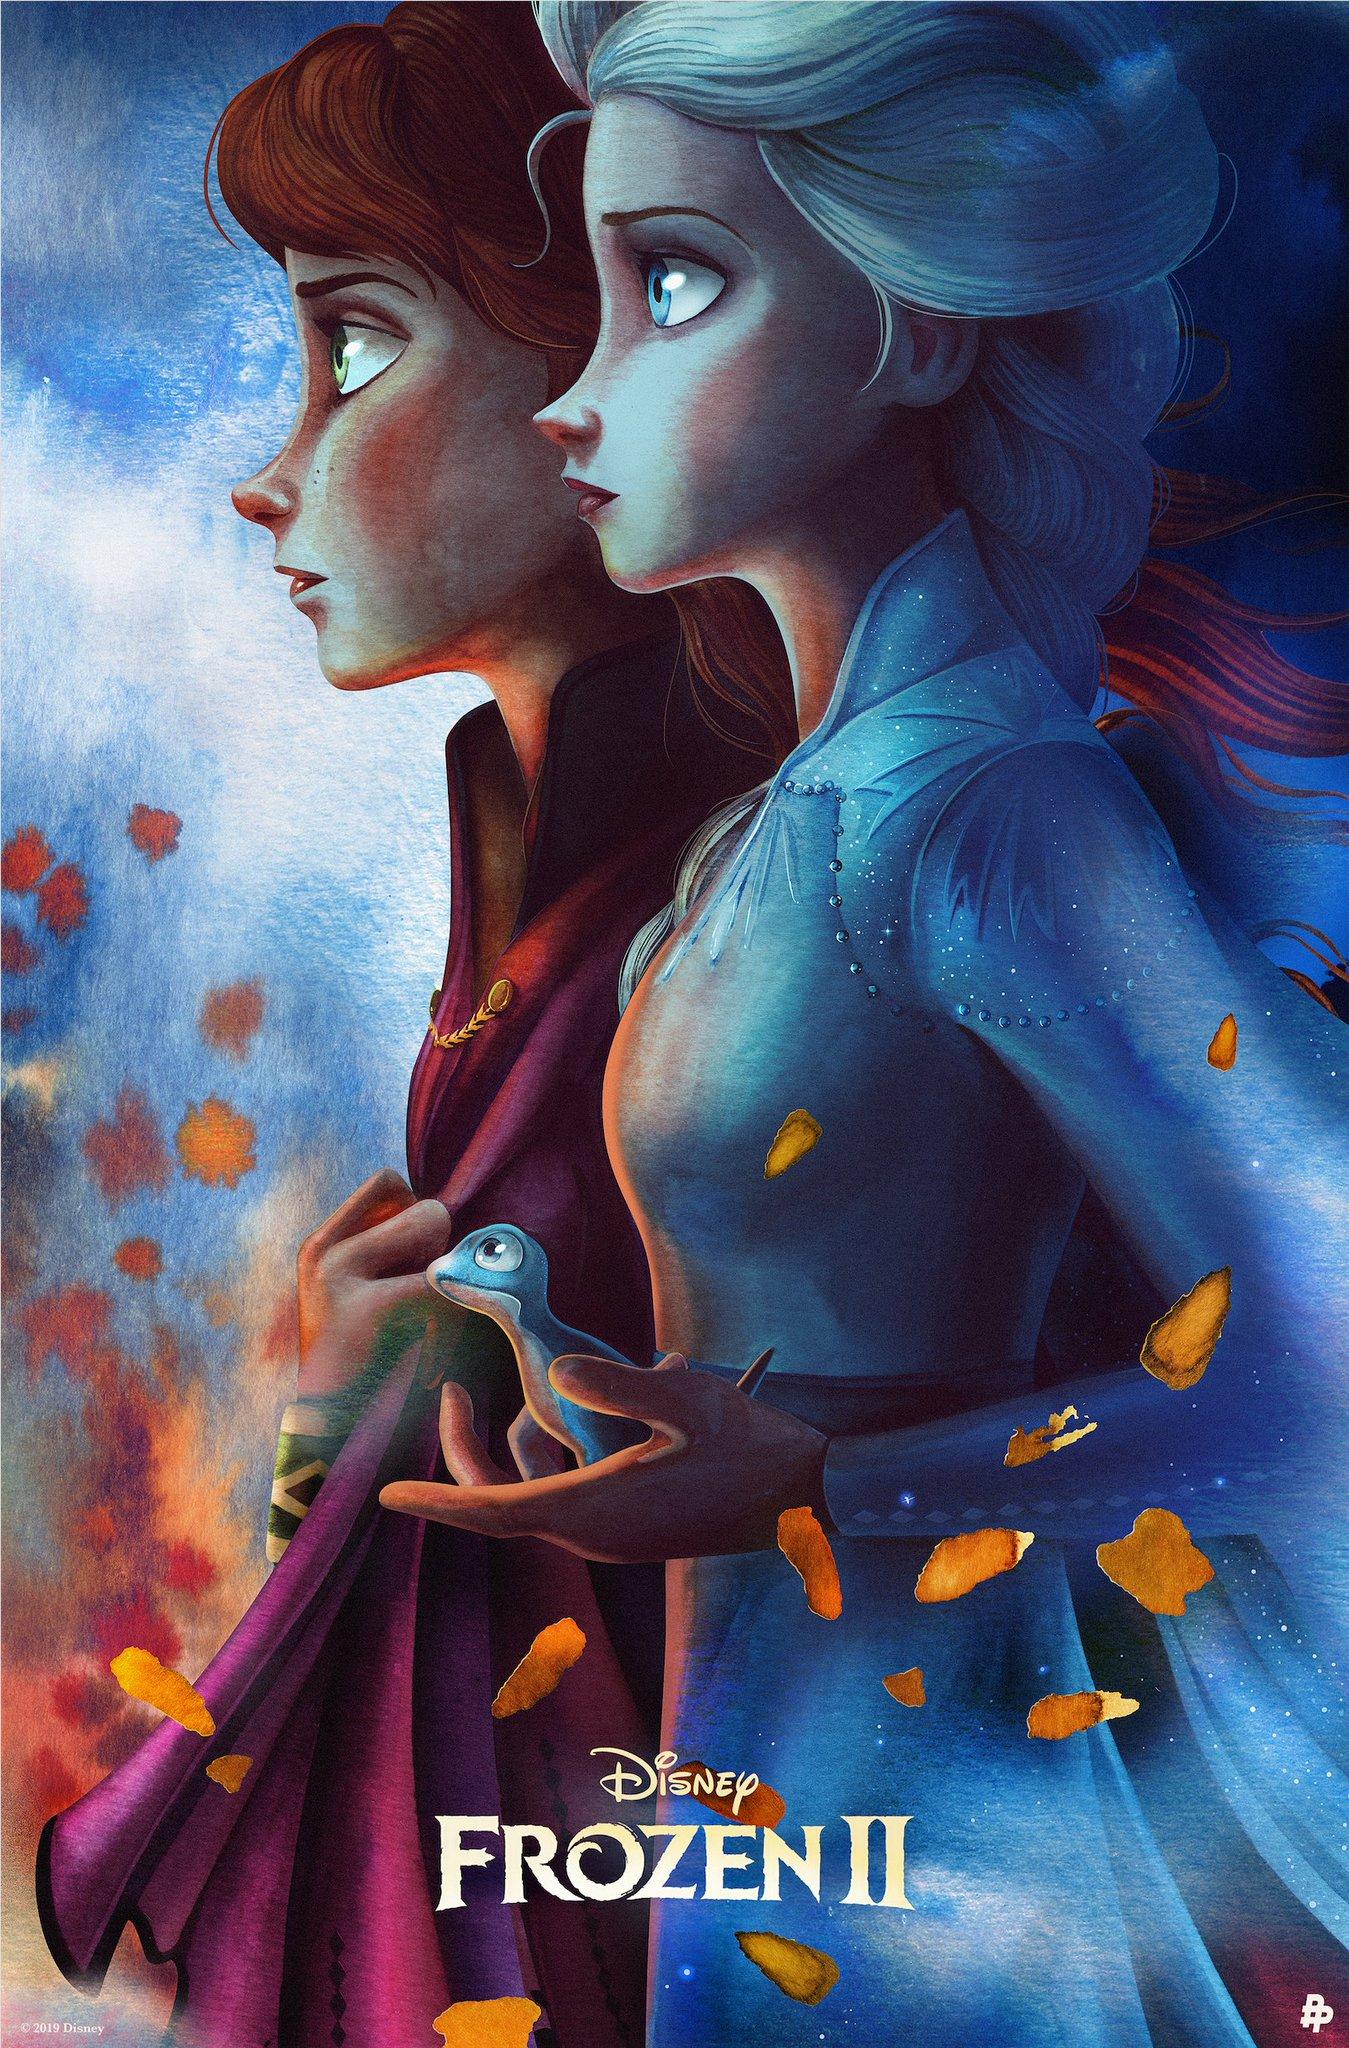 Frozen 2 - Anna and Elsa Poster